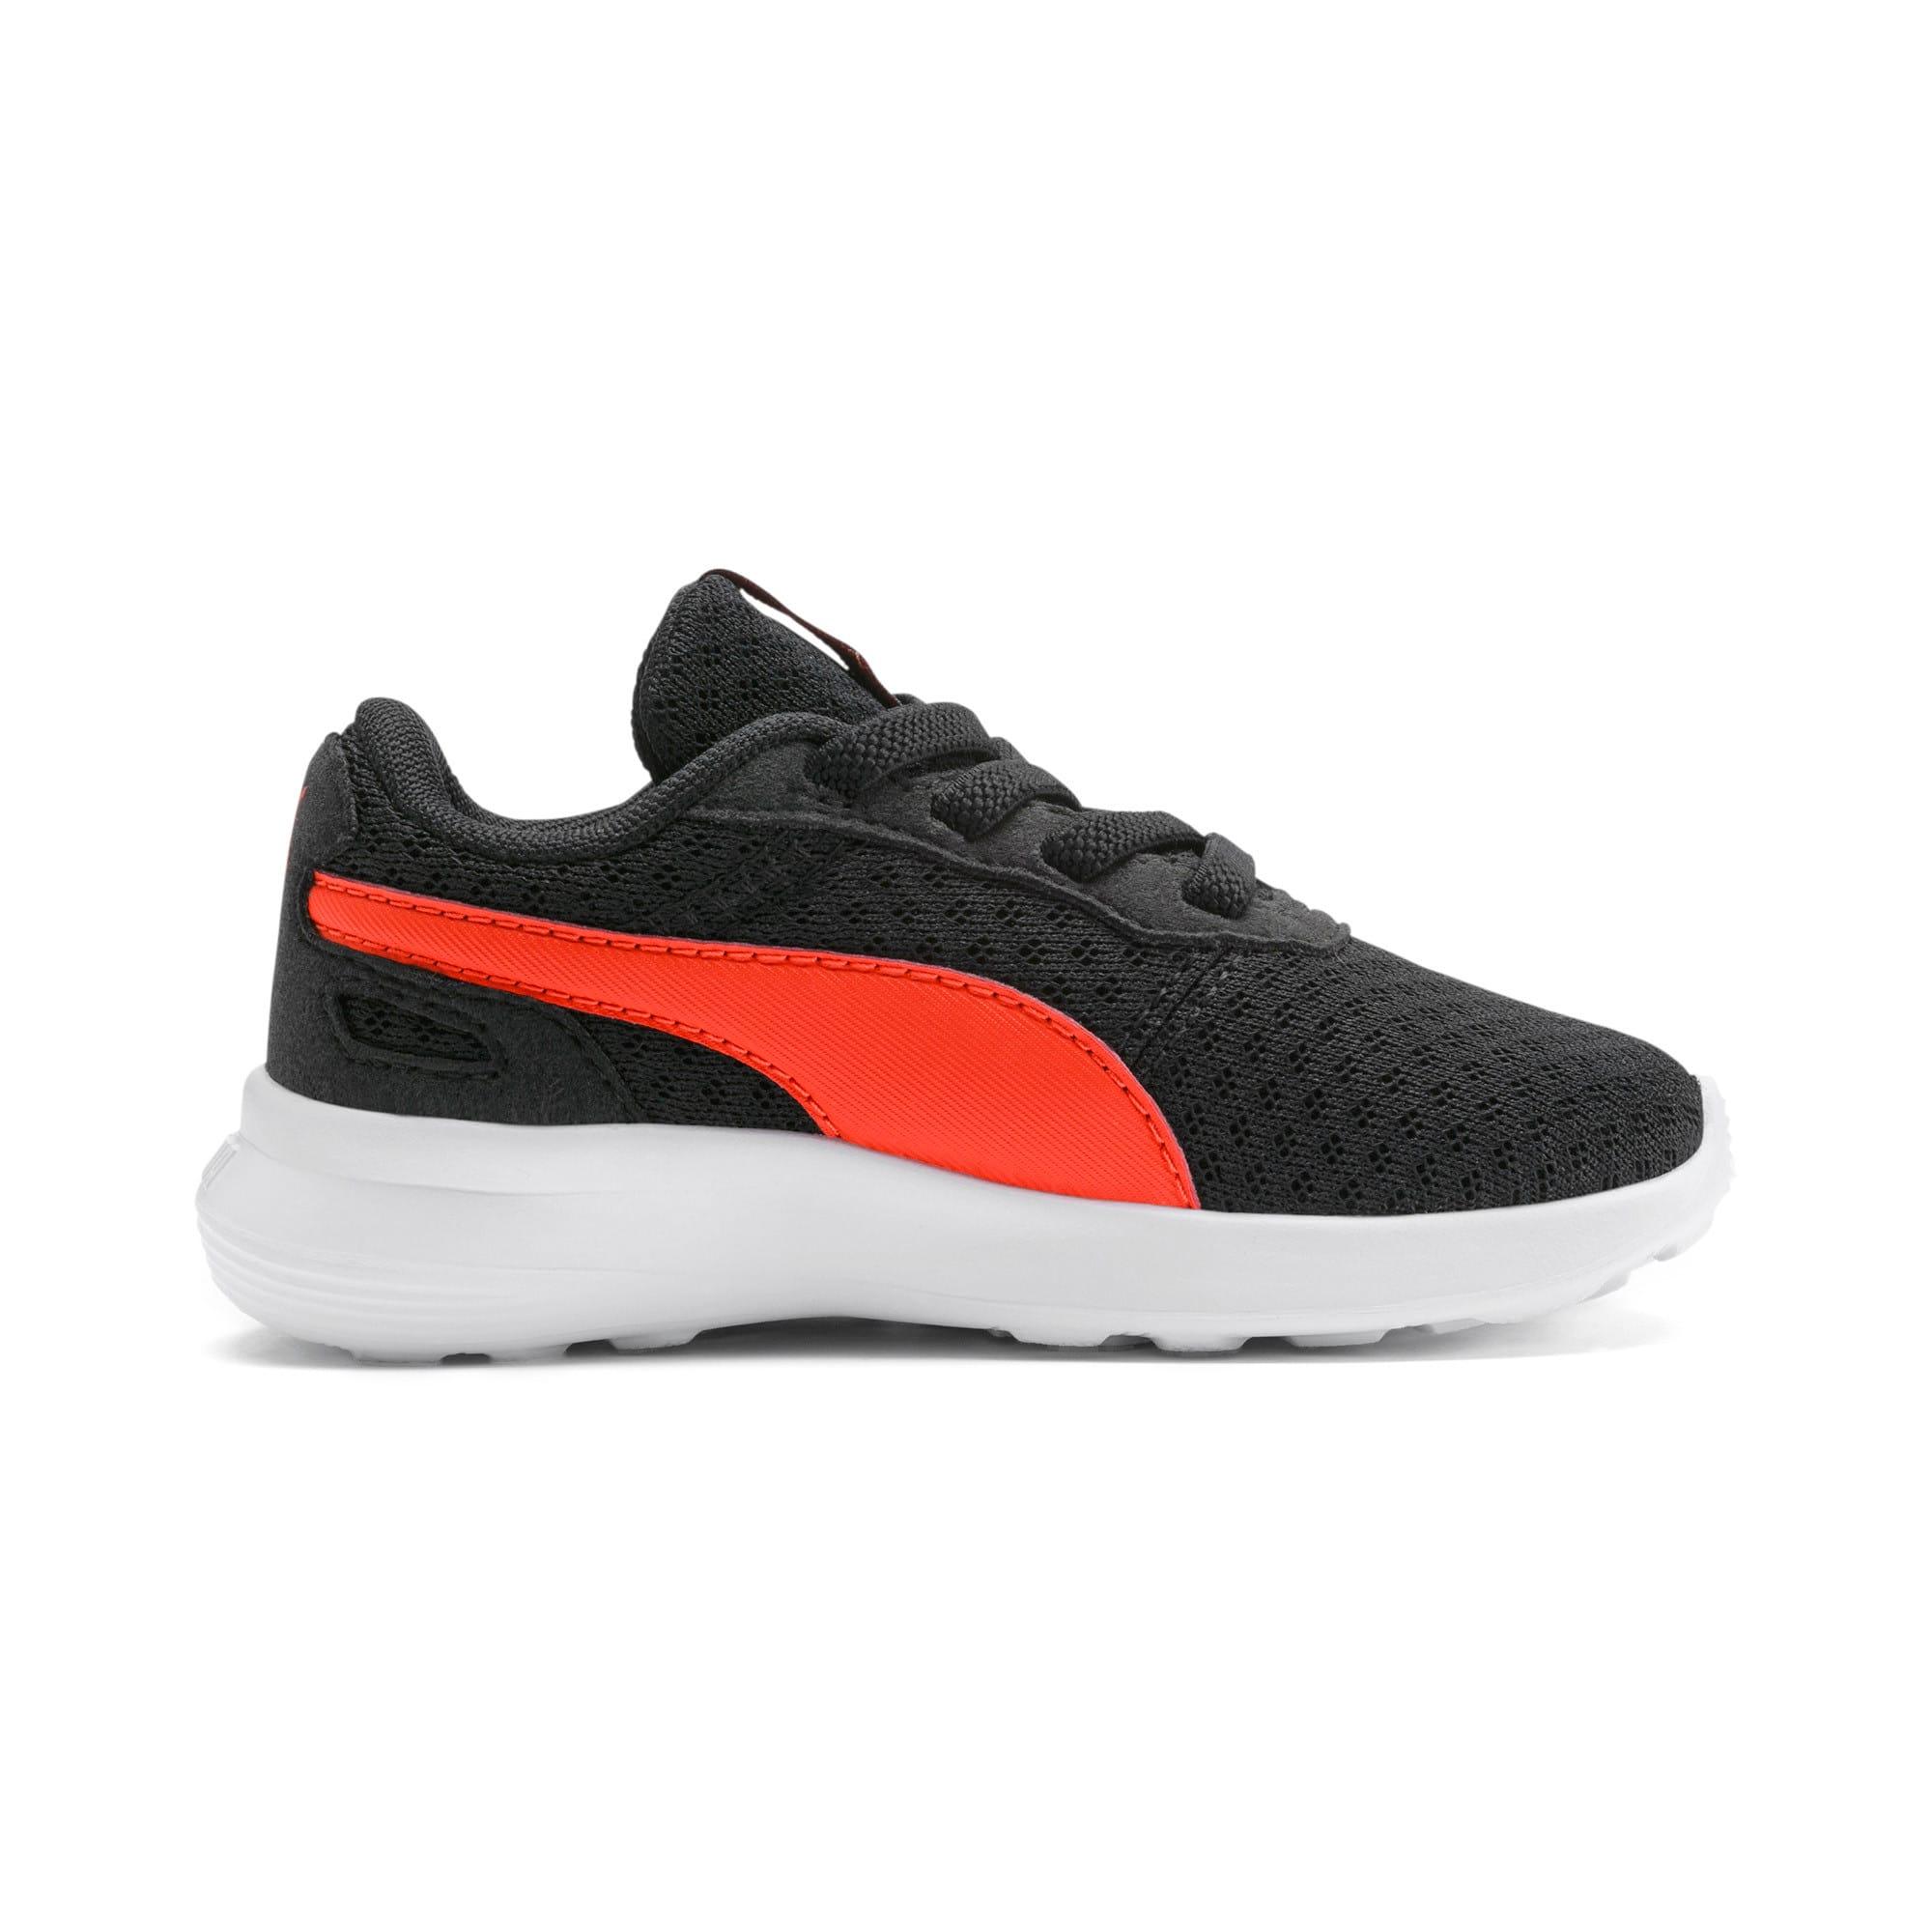 Thumbnail 5 of ST Activate AC Toddler Shoes, Puma Black-Cherry Tomato, medium